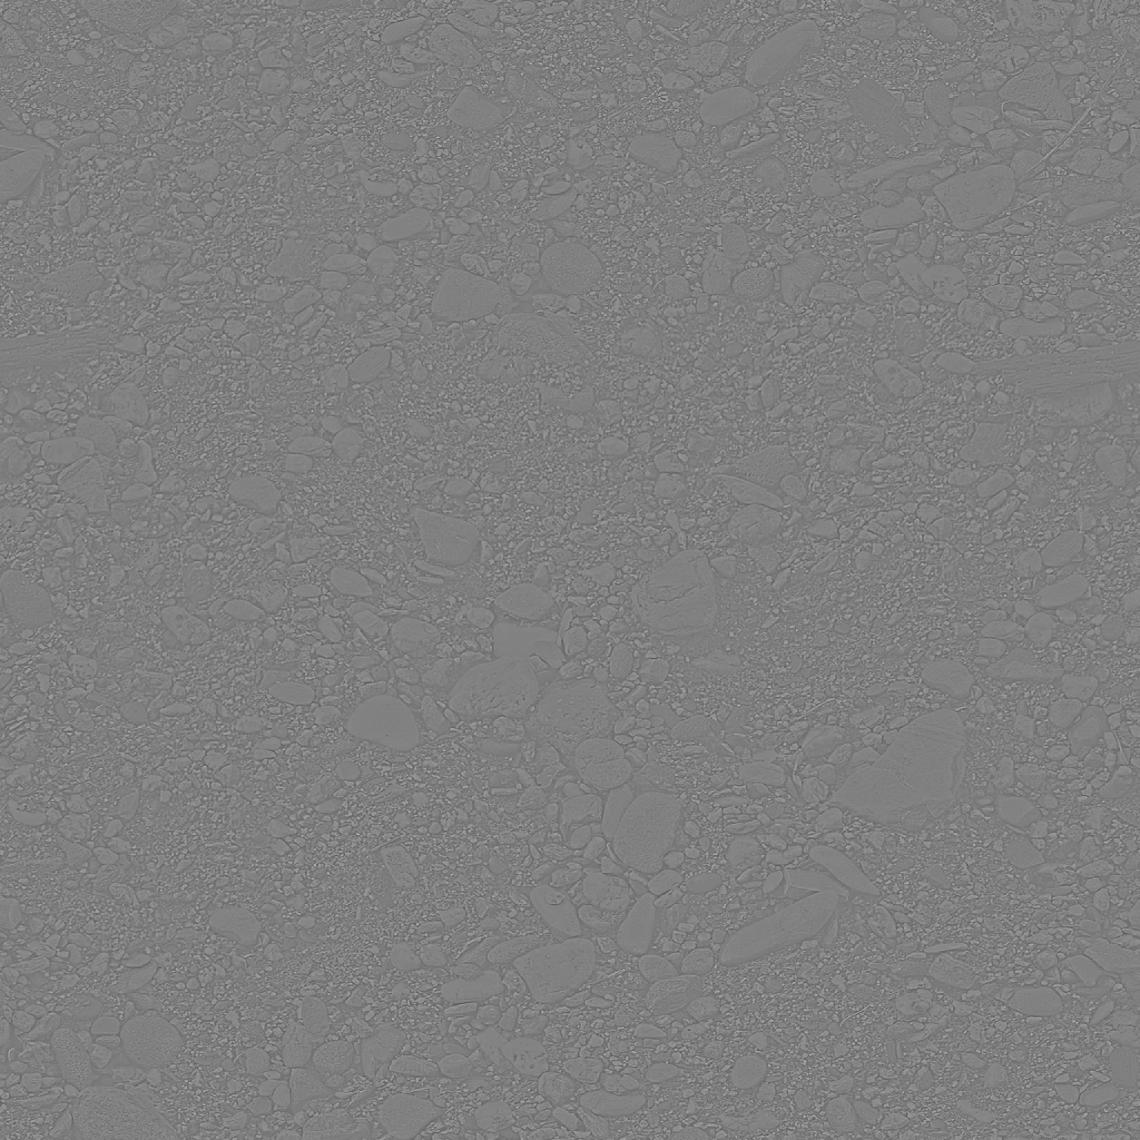 Ground-Stoney-01-Curvature